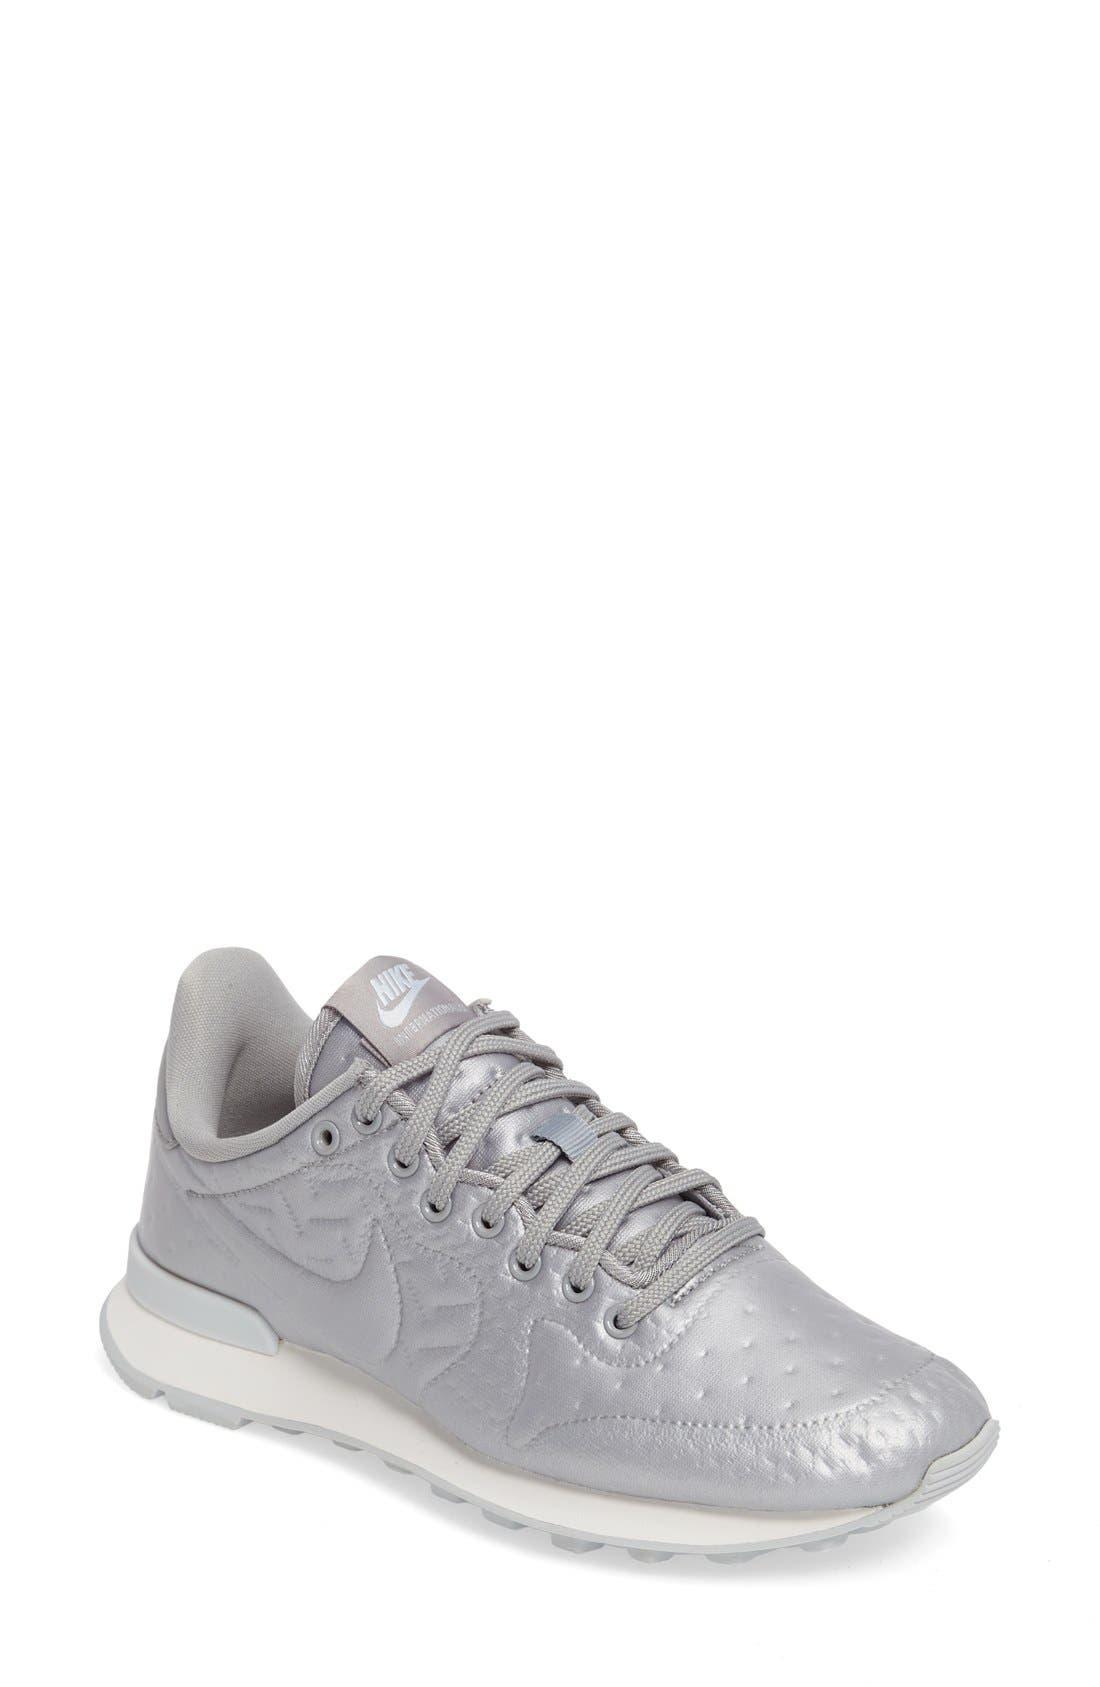 Alternate Image 1 Selected - Nike Internationalist Sneaker (Women)